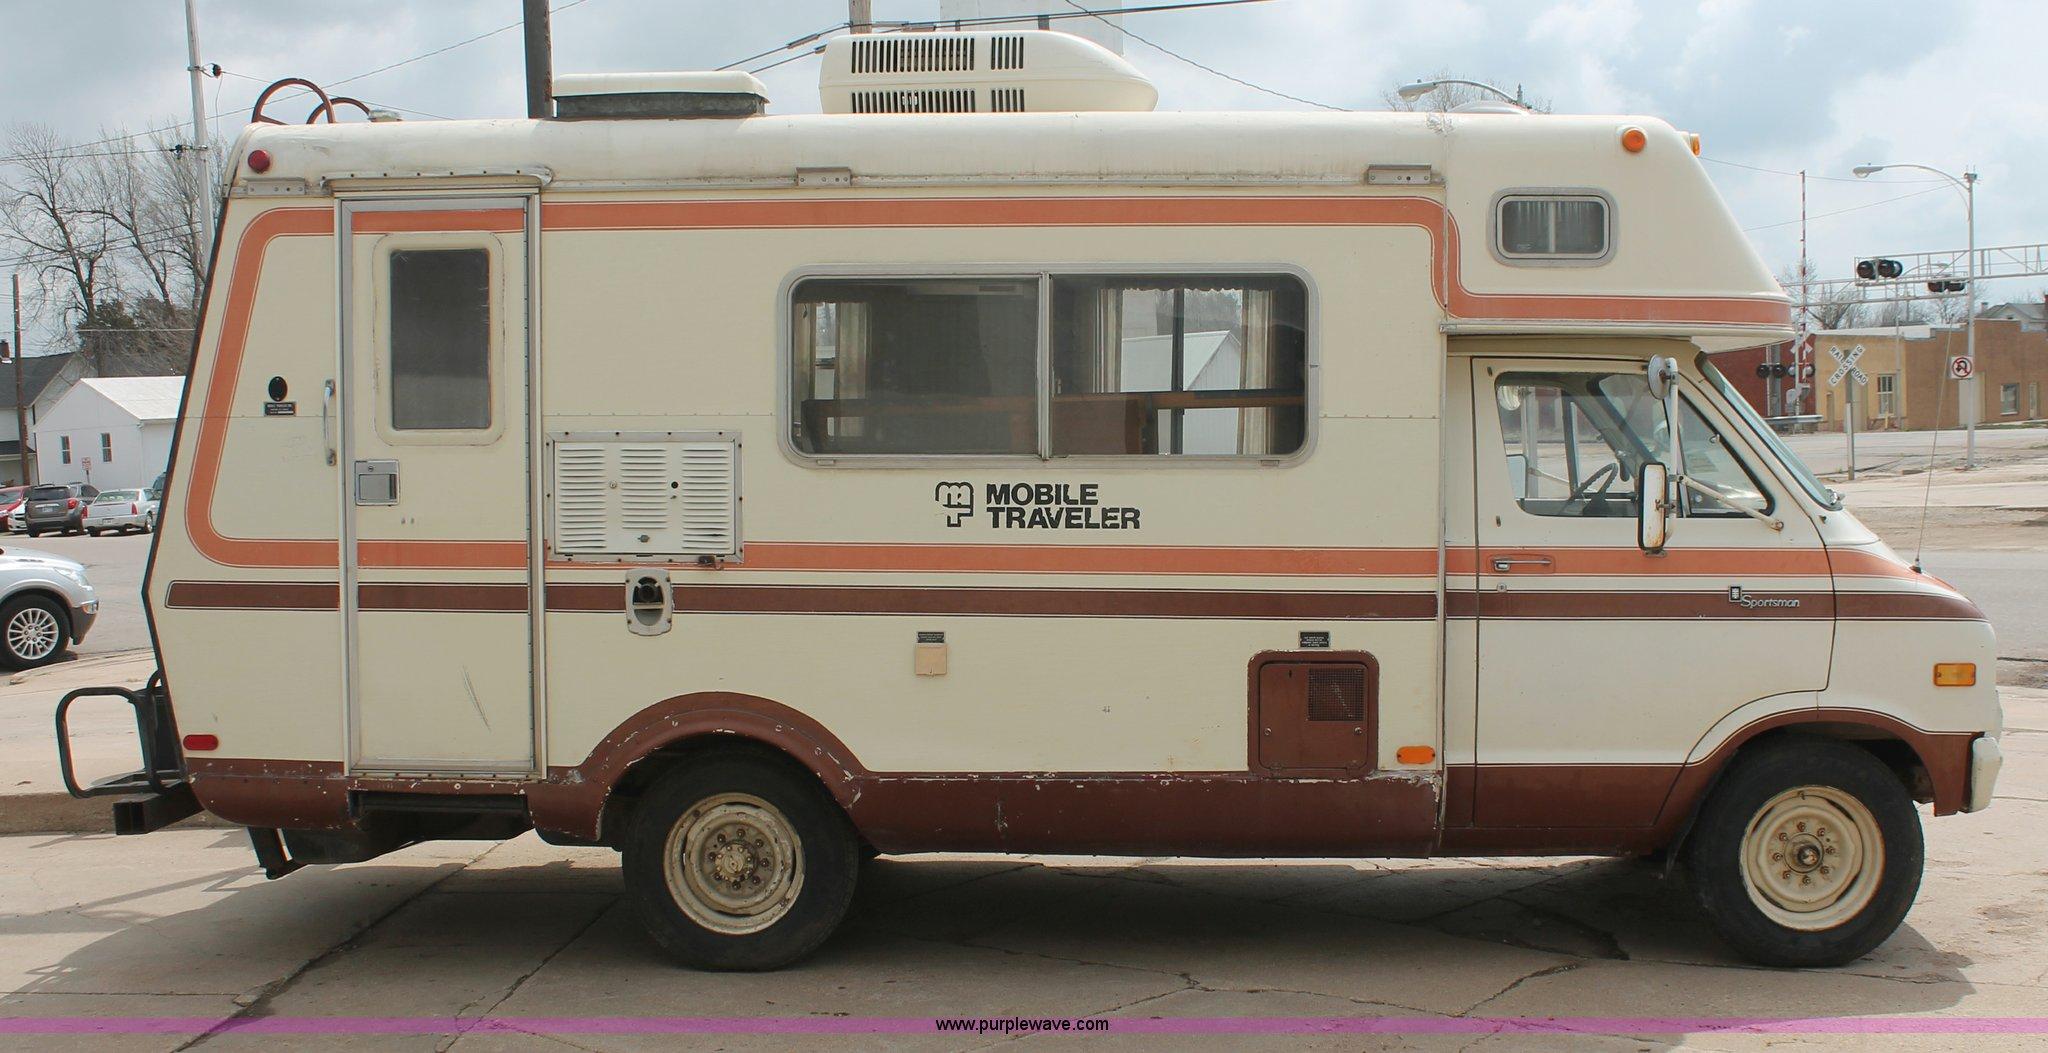 Honey 1976 Dodge Motorhome Wiring Diagram Trusted Diagrams Sportsman 1978 F30 Mobile Traveler Camper Item E3347